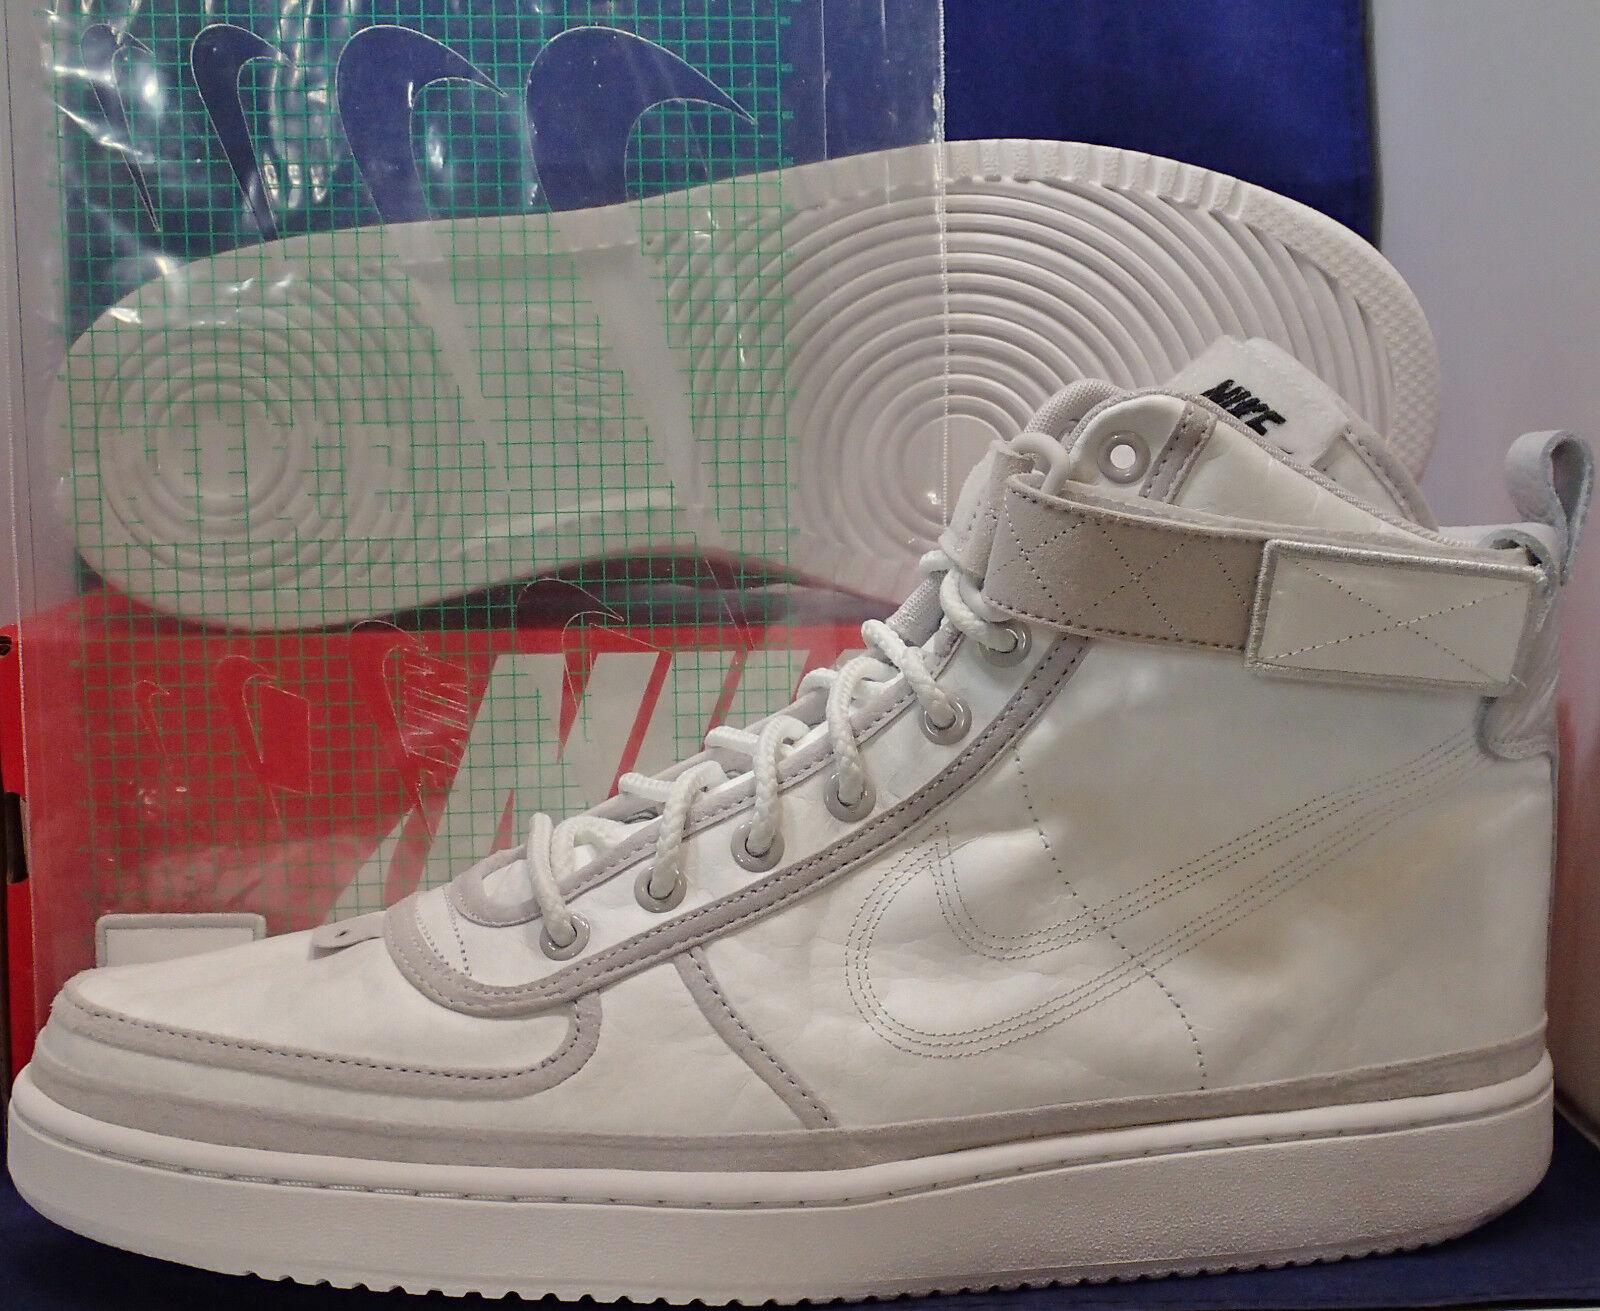 Nike Personalizable Vandal alta Supreme AS All-Star Qs Personalizable Nike (AQ0113-001) 0a4f7e